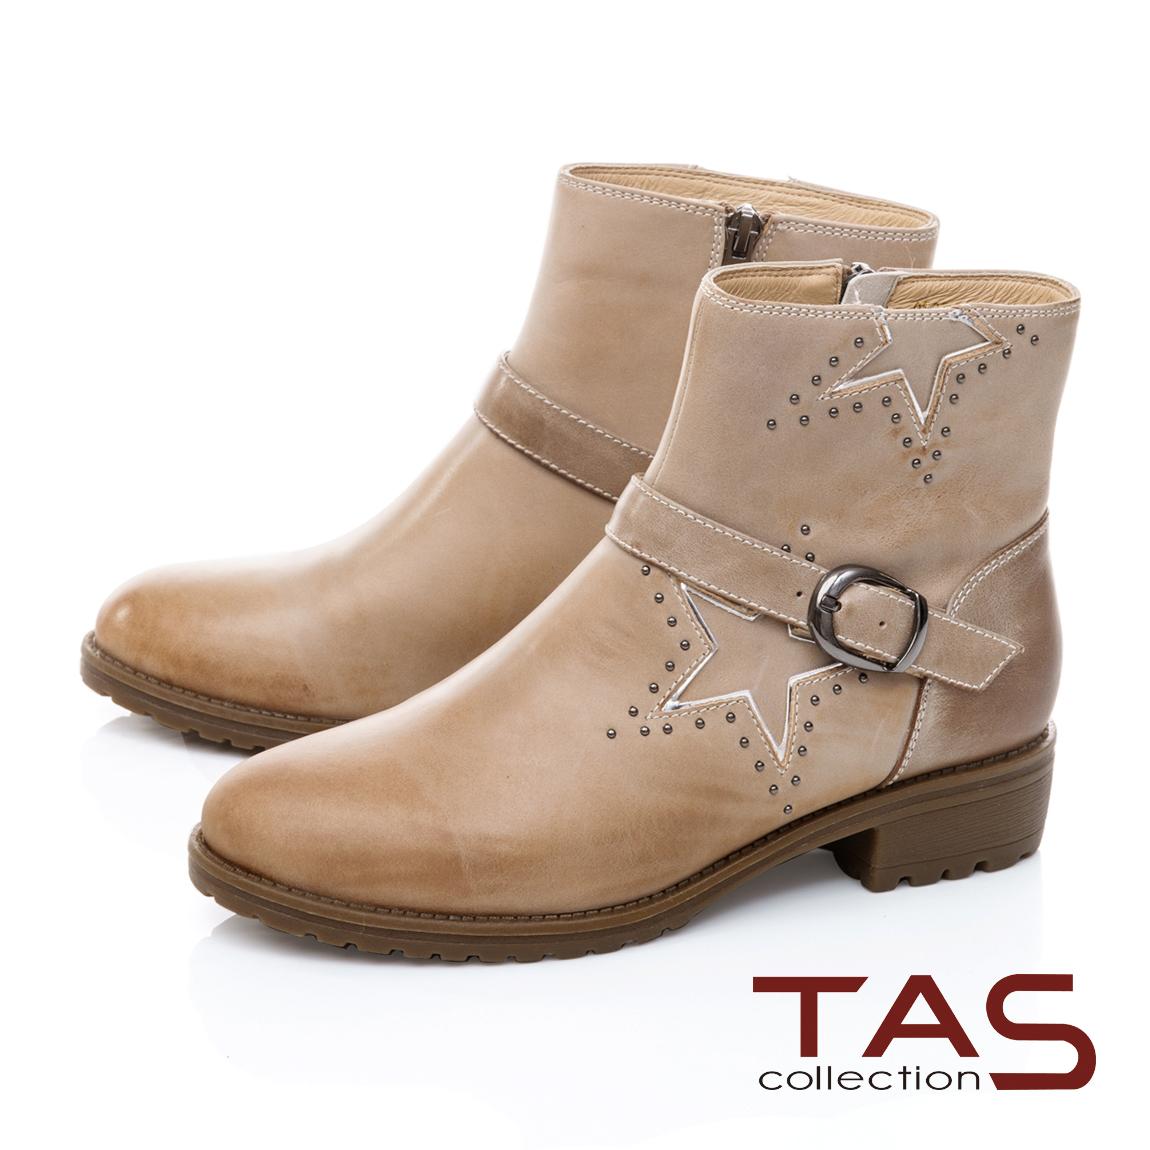 TAS造型金屬鉚釘拼接皮帶繞踝低跟短靴-質感米